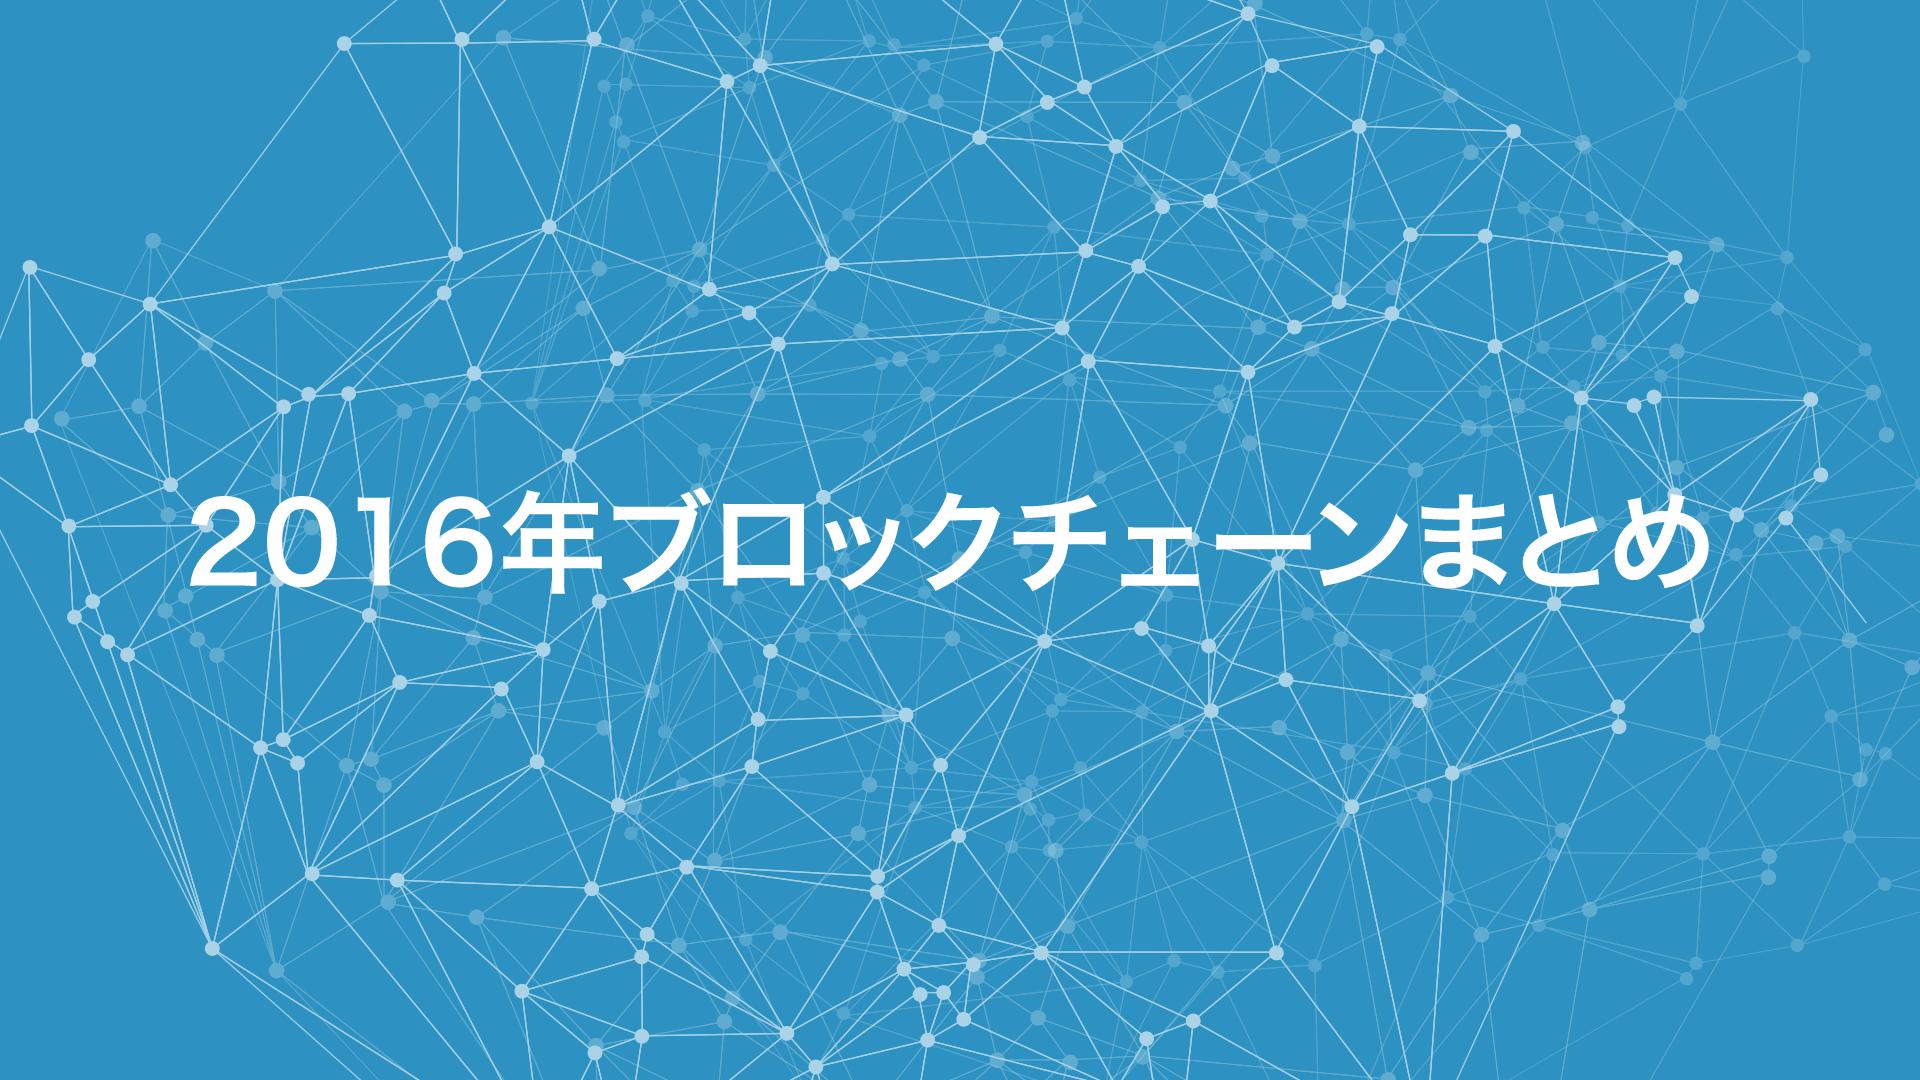 Blockchain2016matome Images 01